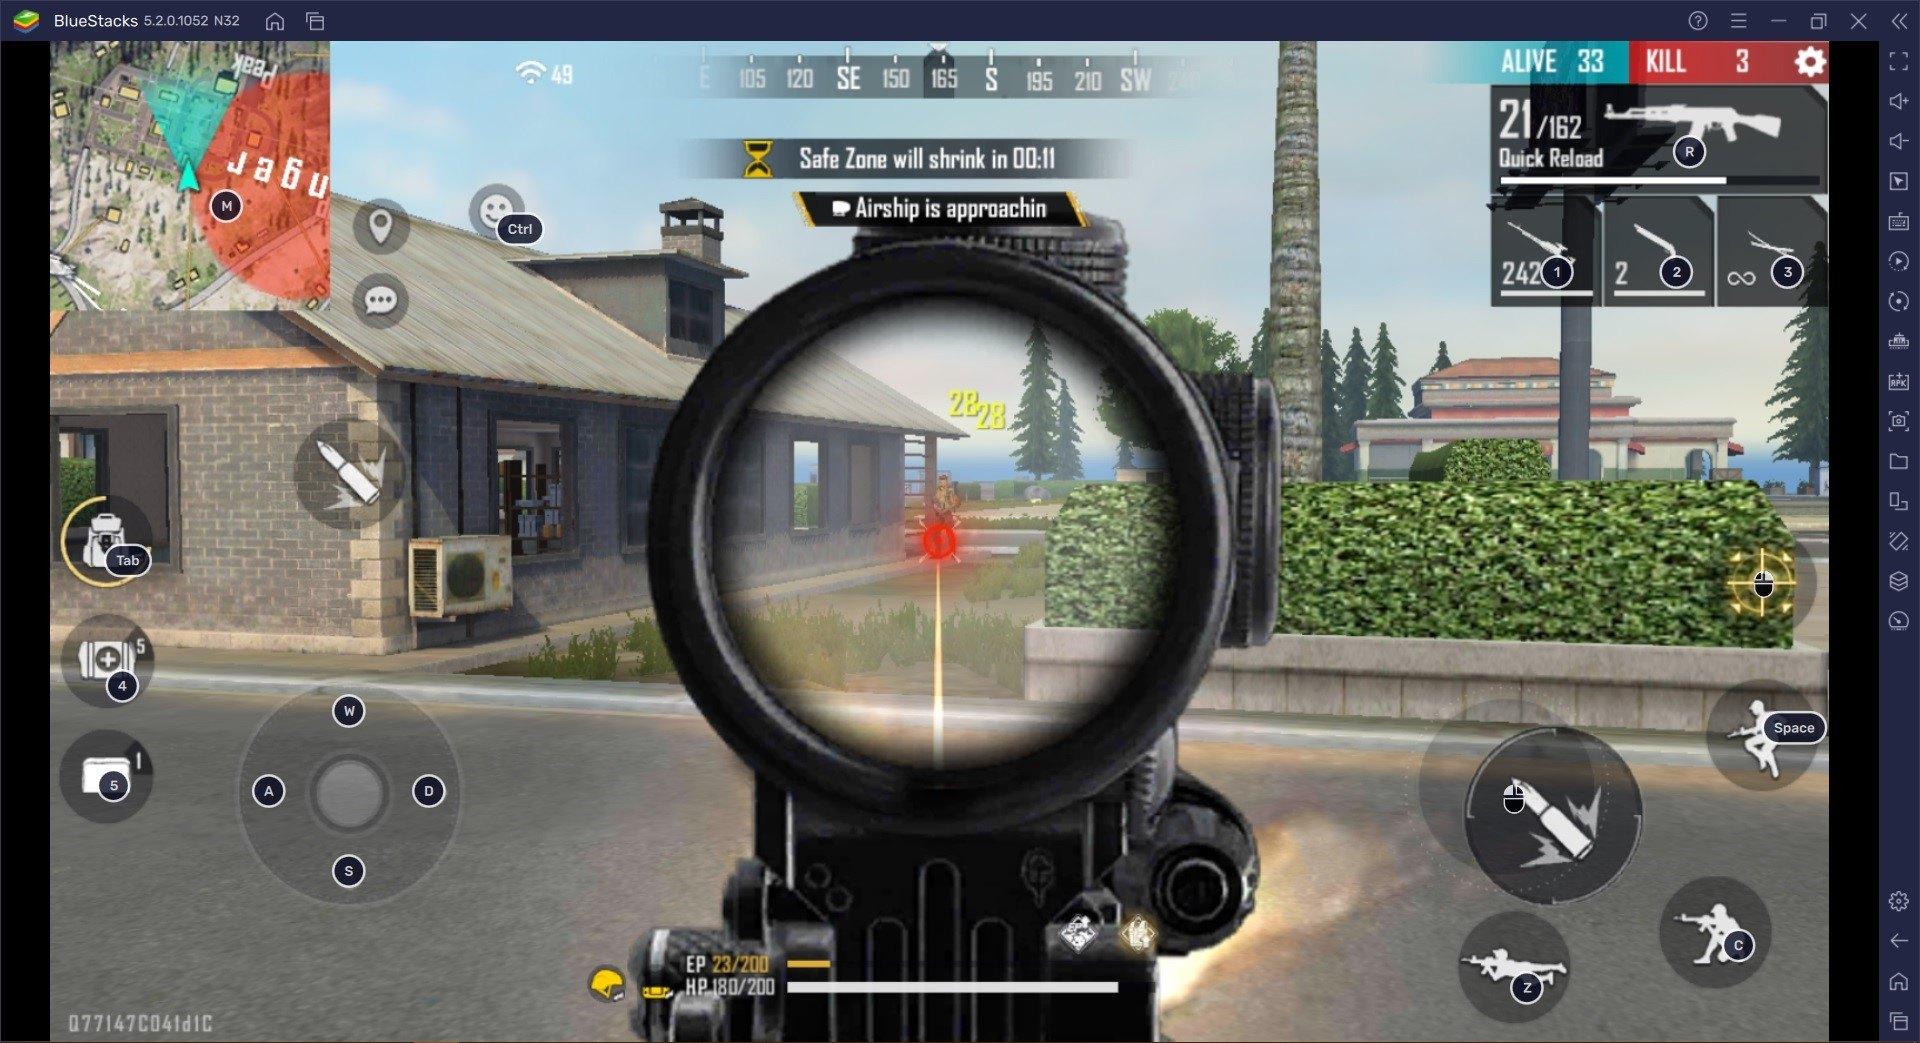 Free Fire Guide For Solo Vs Squad Games For Maximum Kills